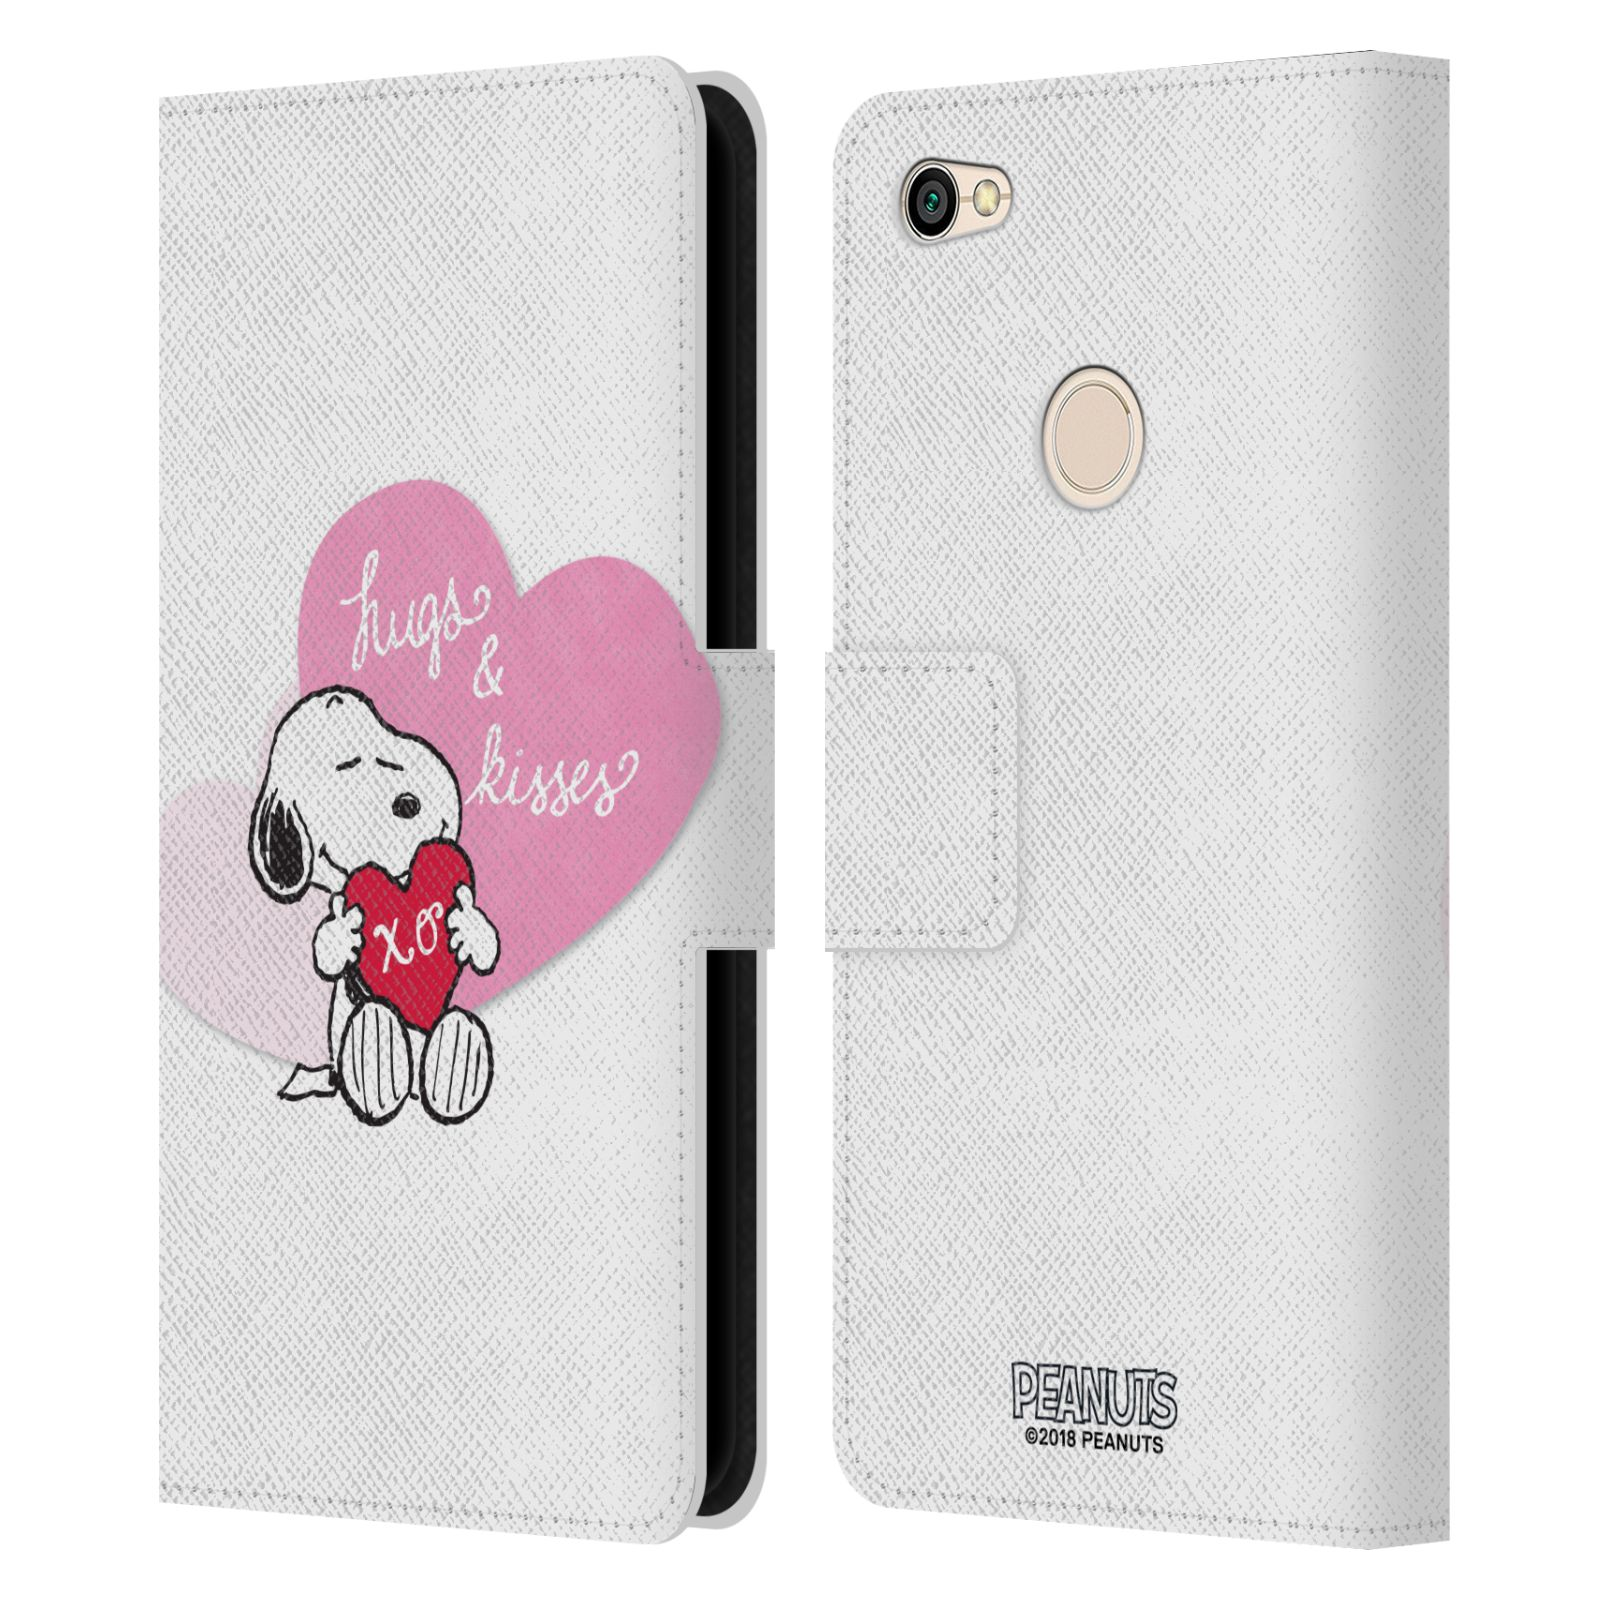 Pouzdro na mobil Xiaomi Redmi Note 5A - Head Case - Peanuts - Snoopy pejsek se srdíčkem